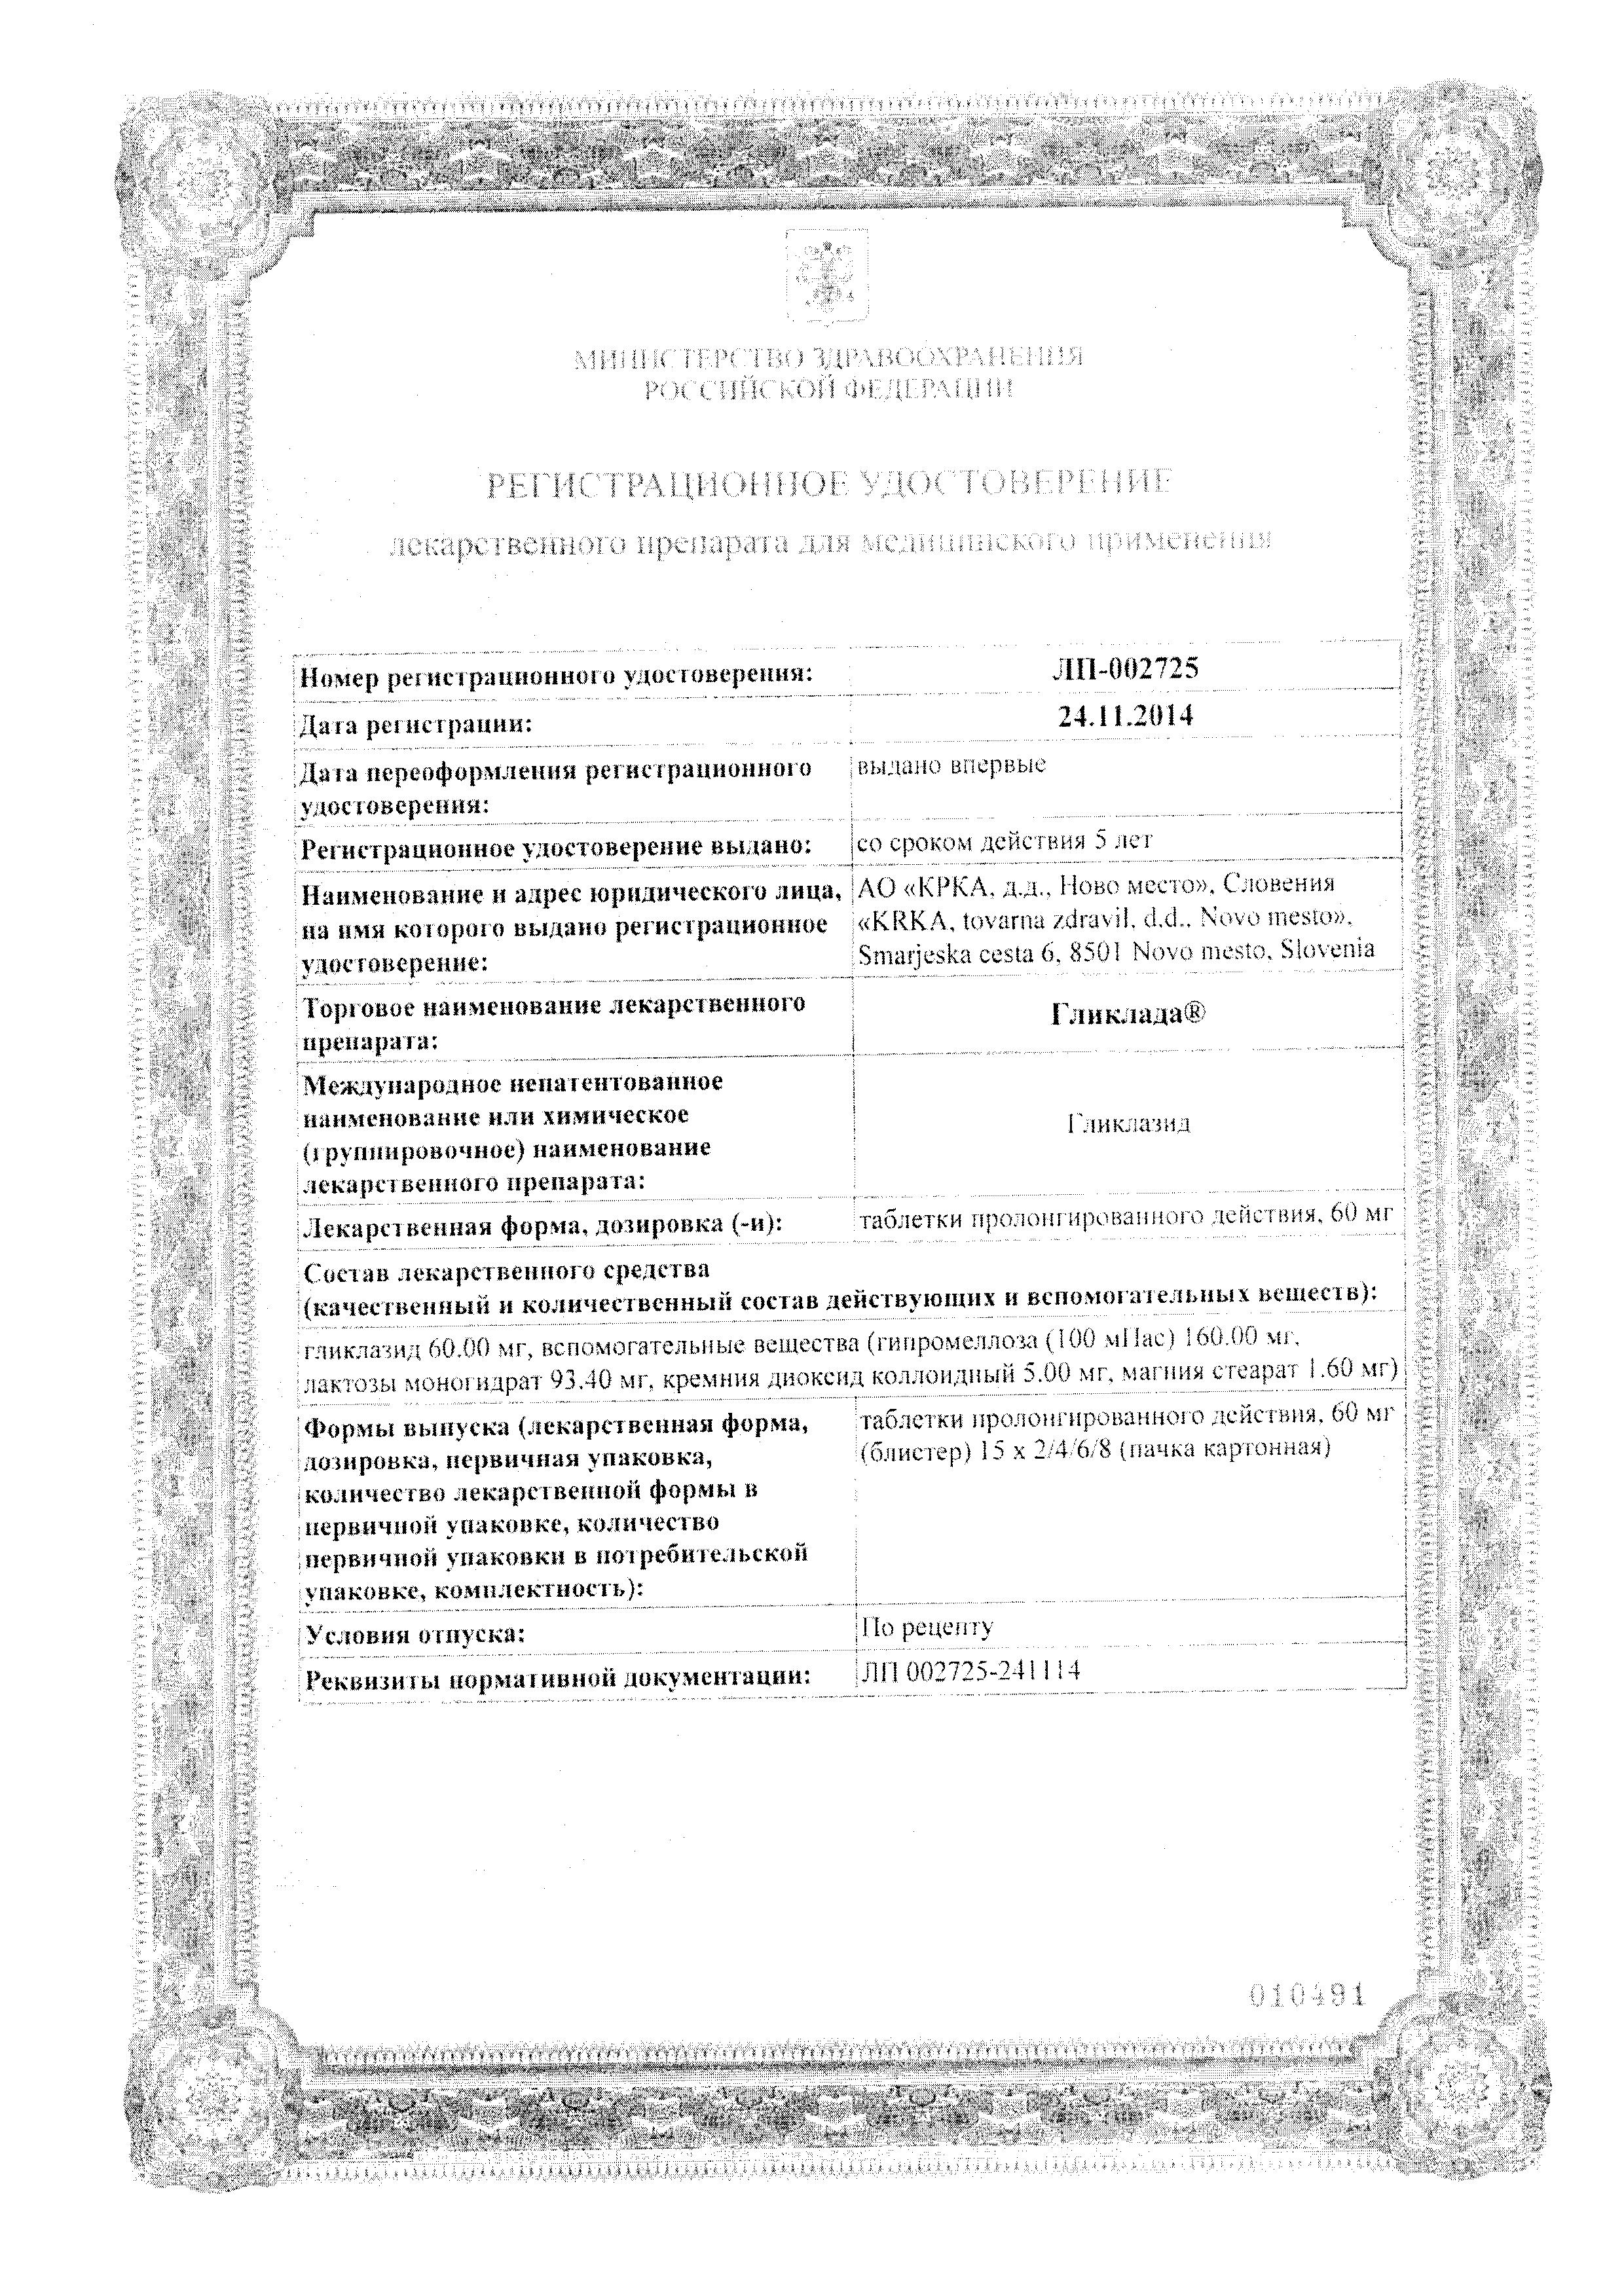 Гликлада сертификат